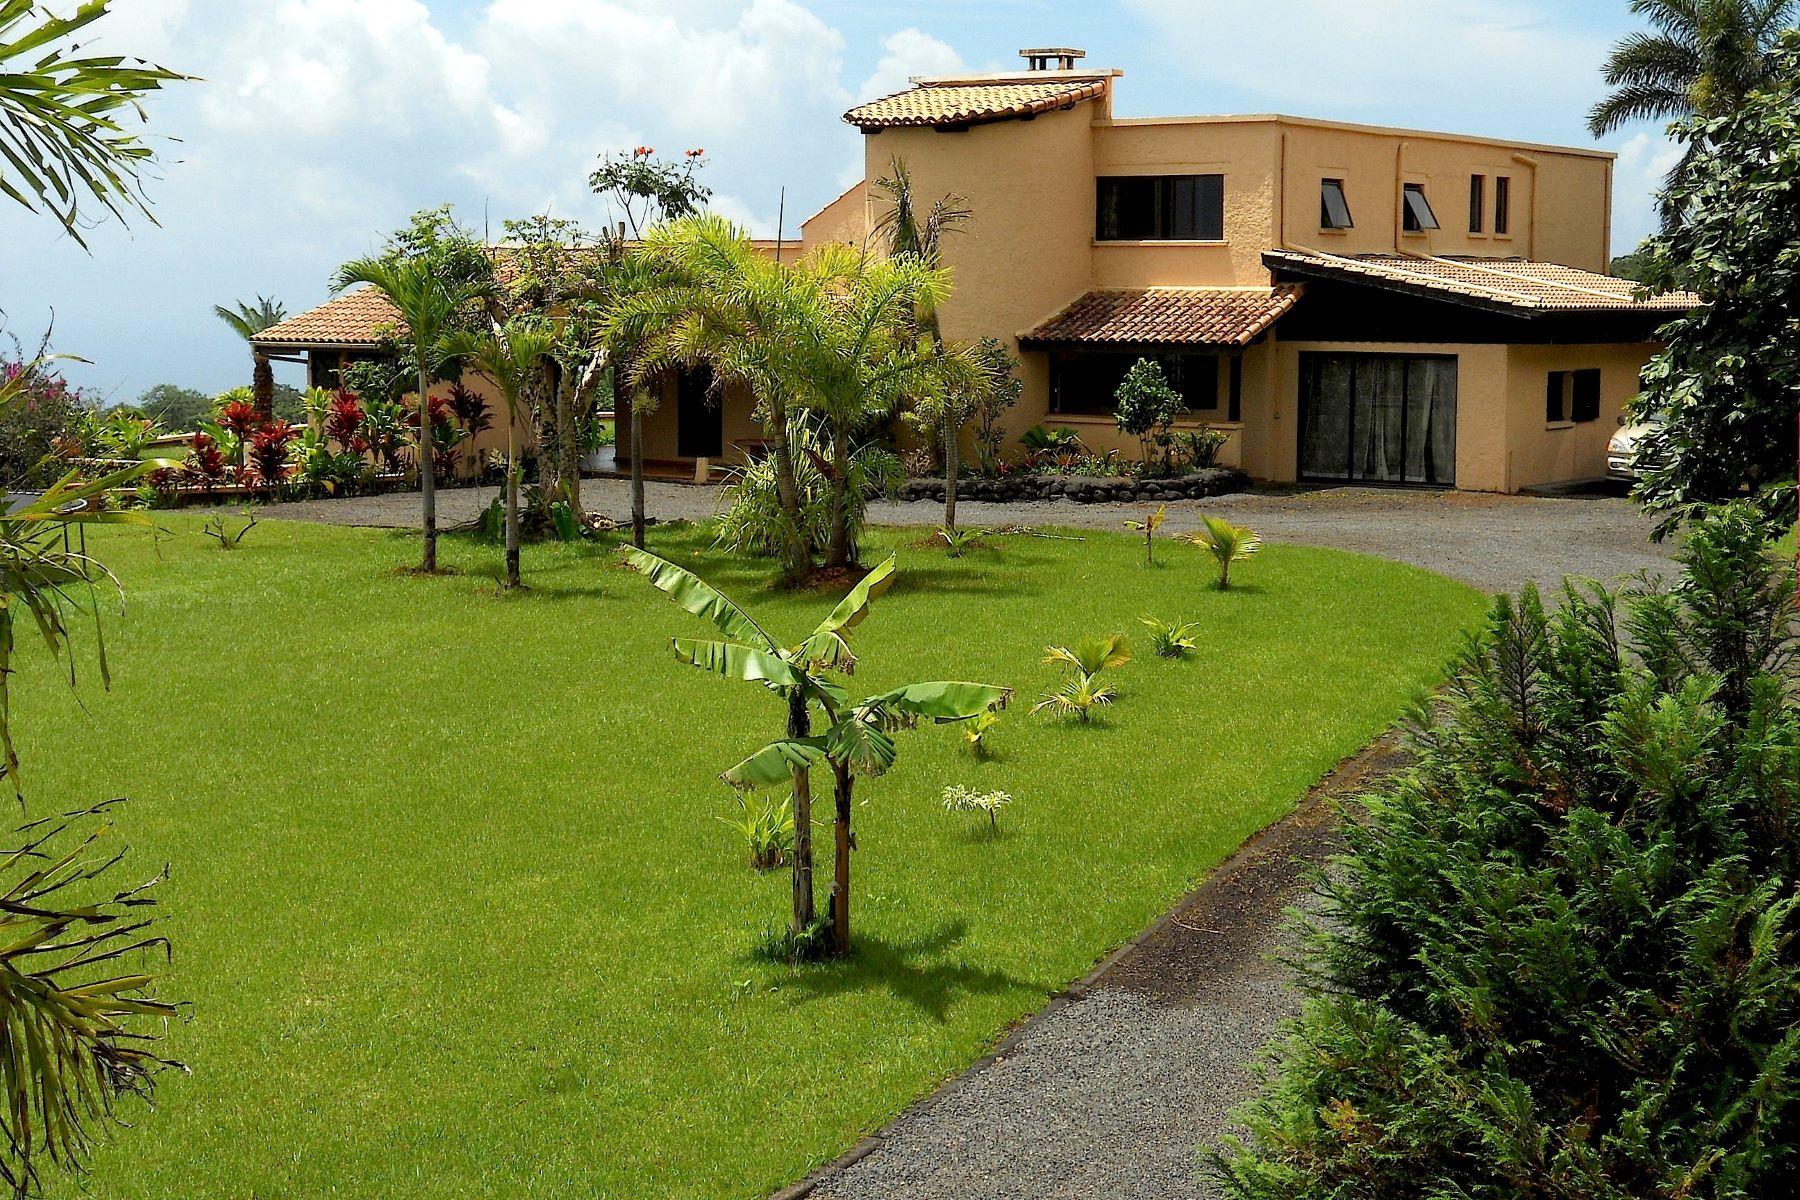 Casa Unifamiliar por un Venta en Provencal style villa Tahiti, French Polynesia